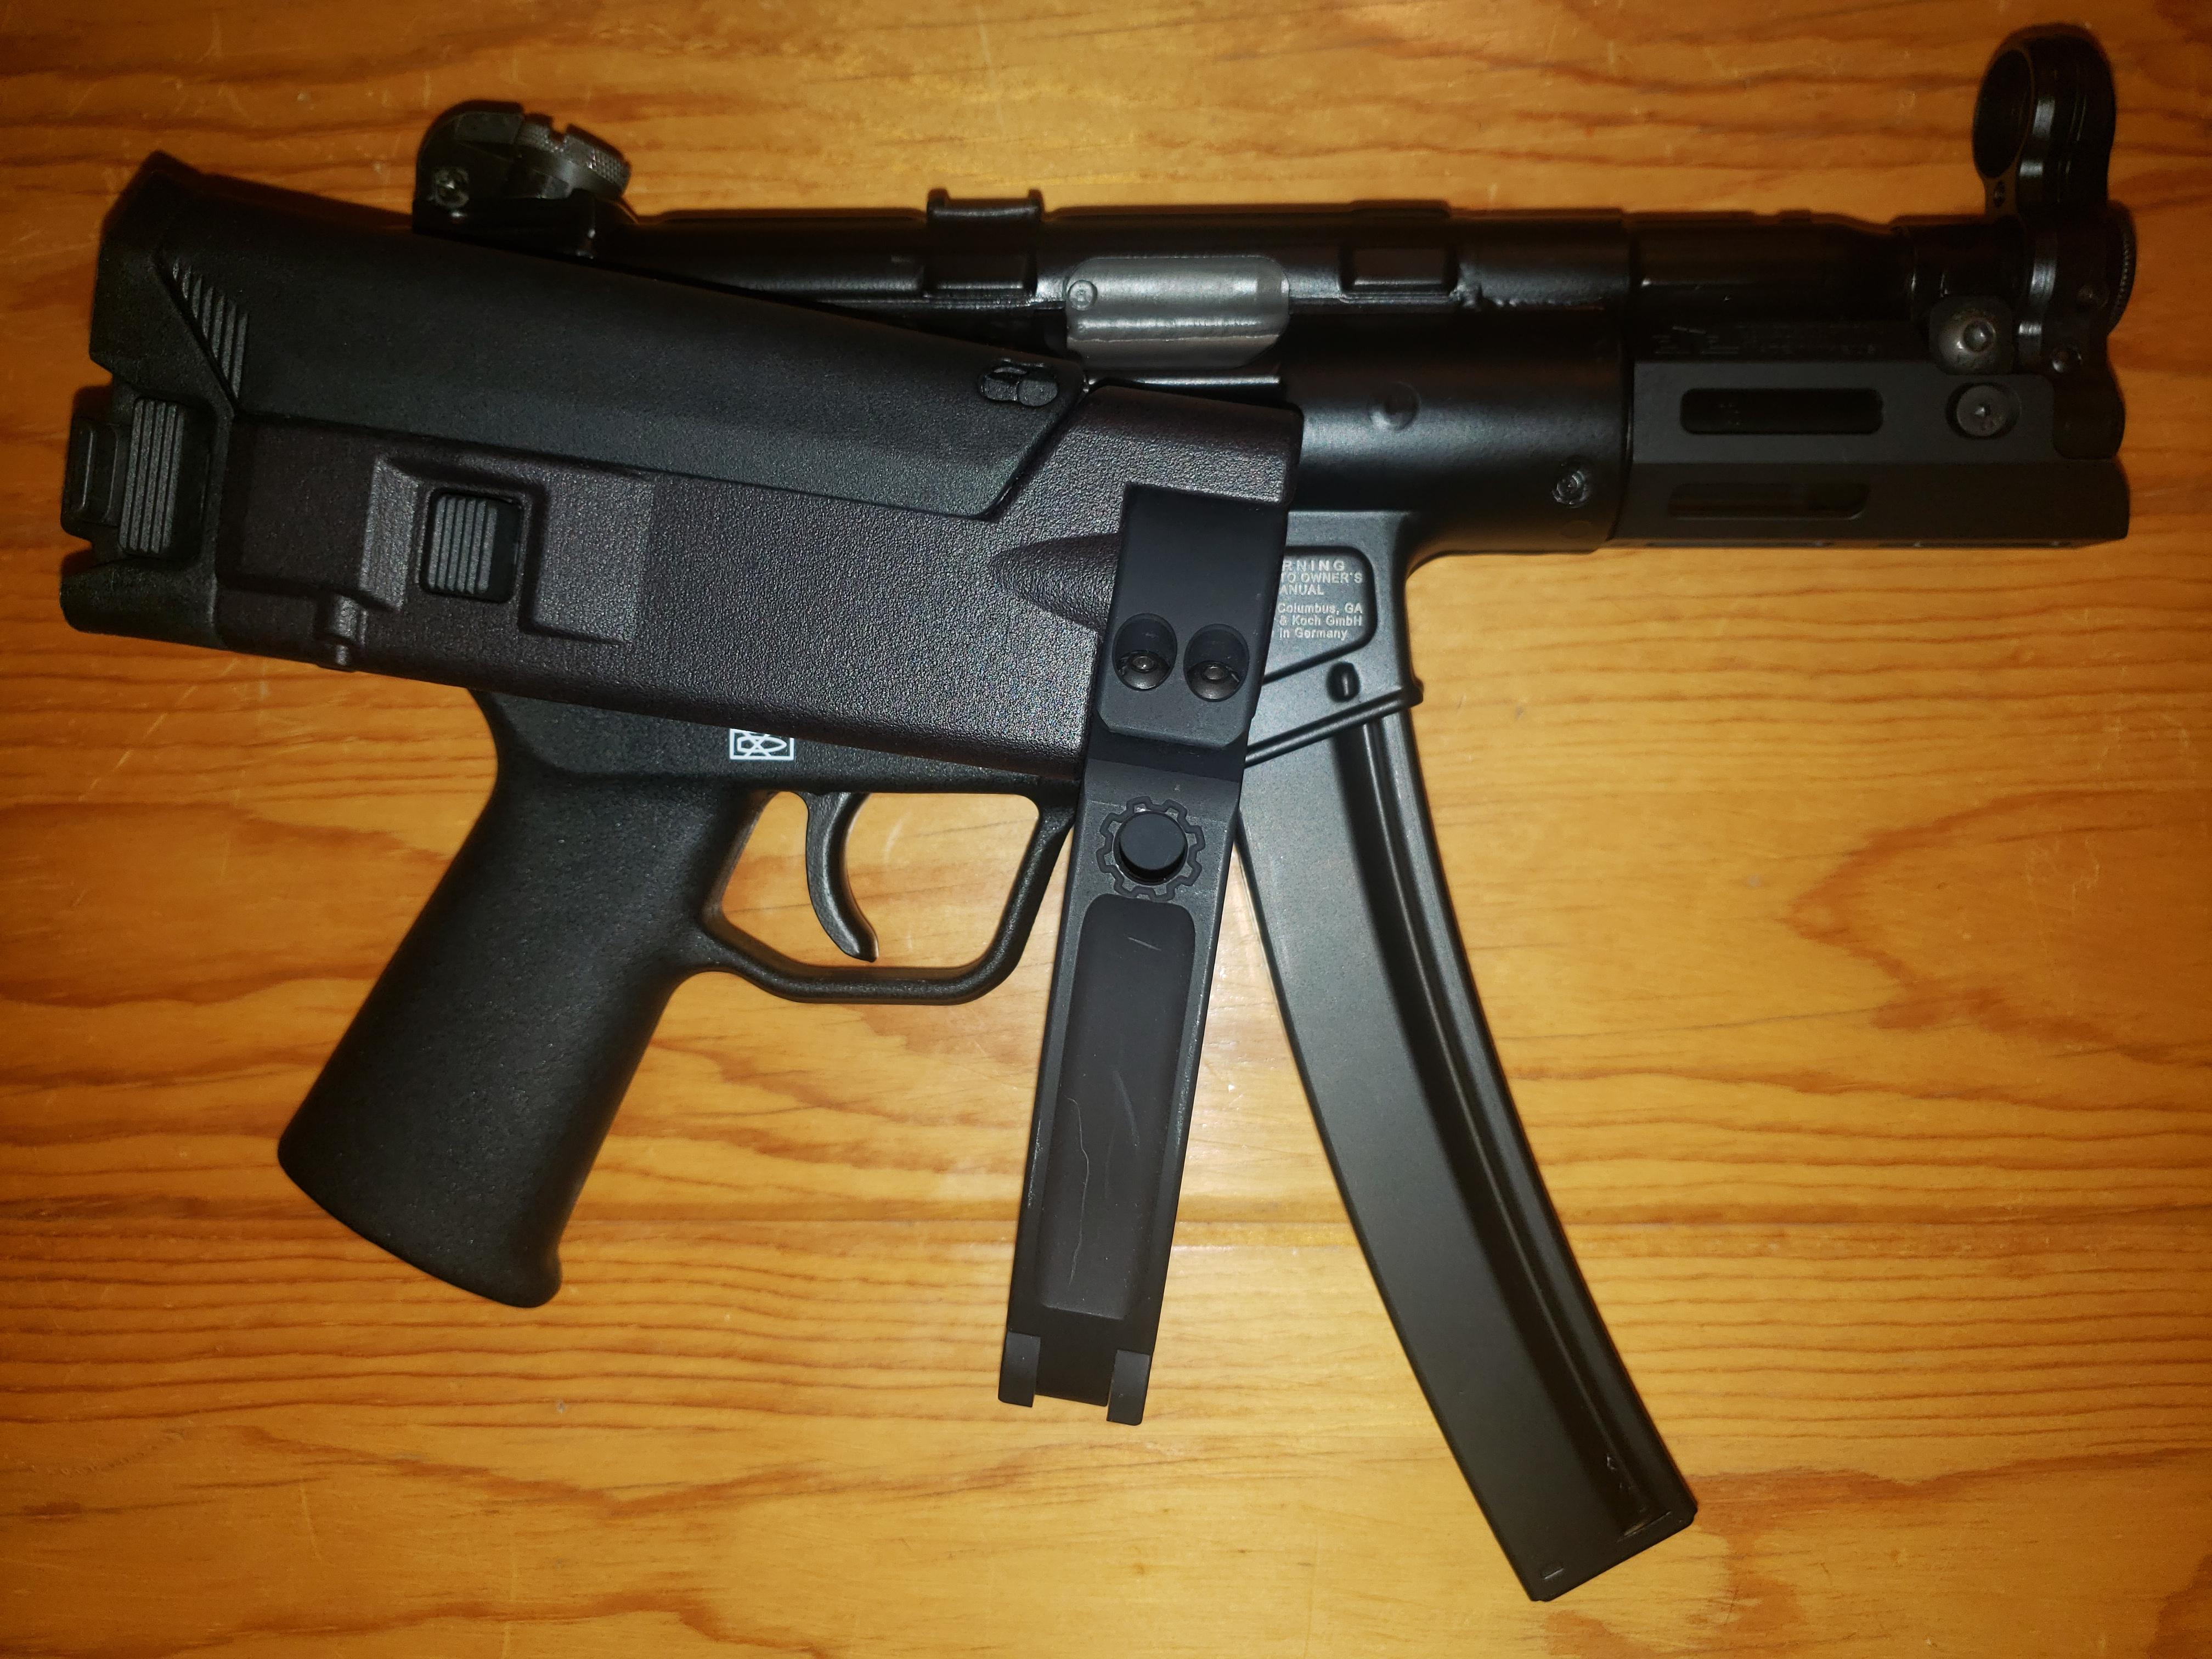 MP5 ACR Stock Adaptors In Production-20200226_181653_1582760028977.jpg